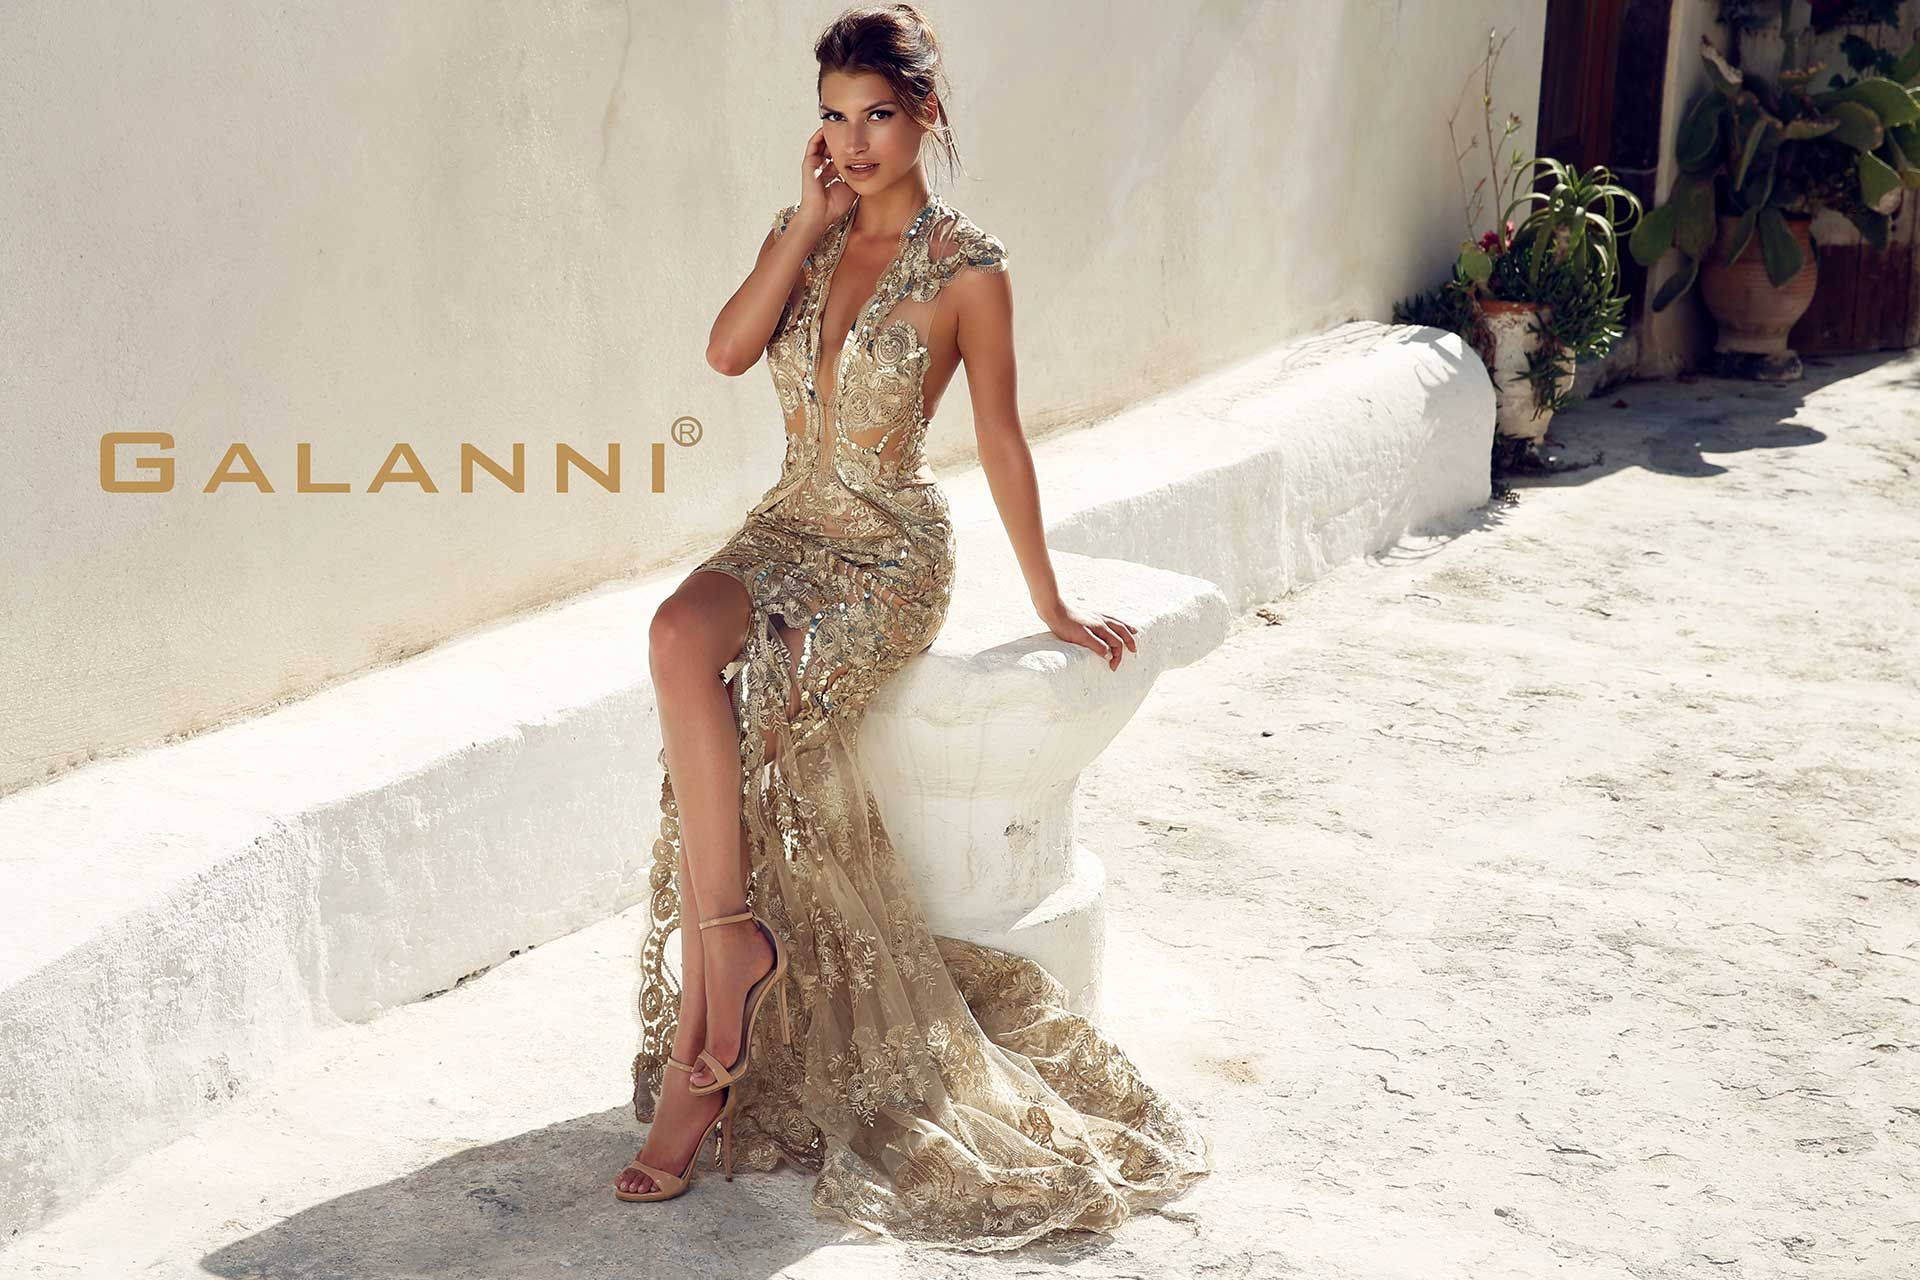 Klevis galanni white dress